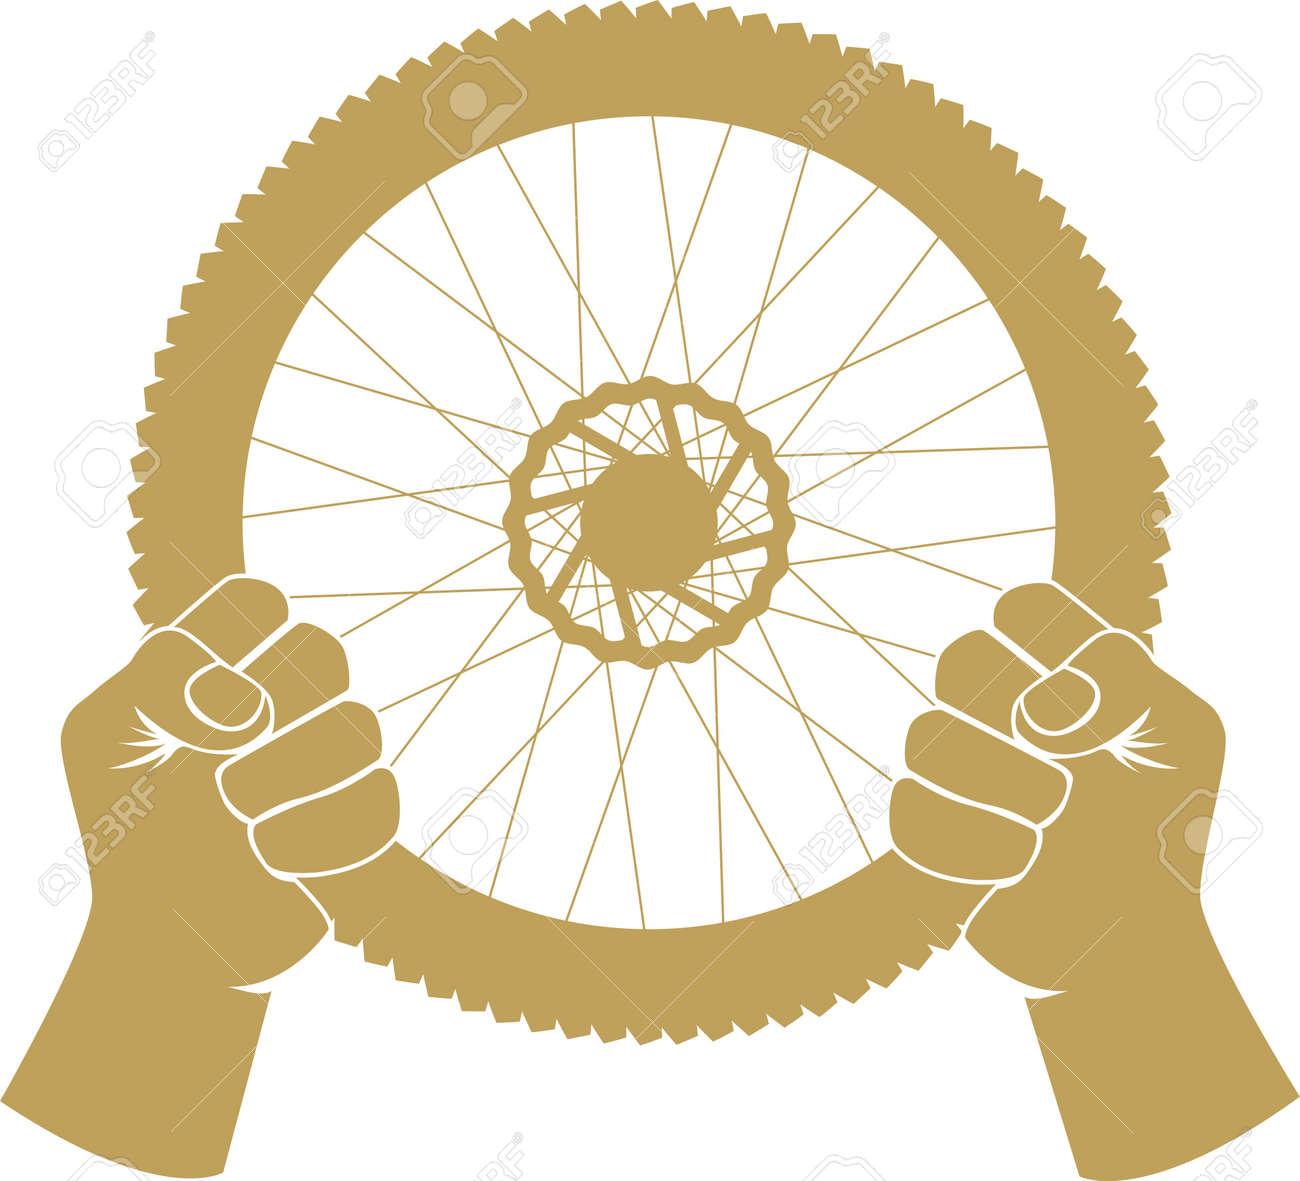 Vector illustration of a bike wheel used as car steering wheel - 22188373